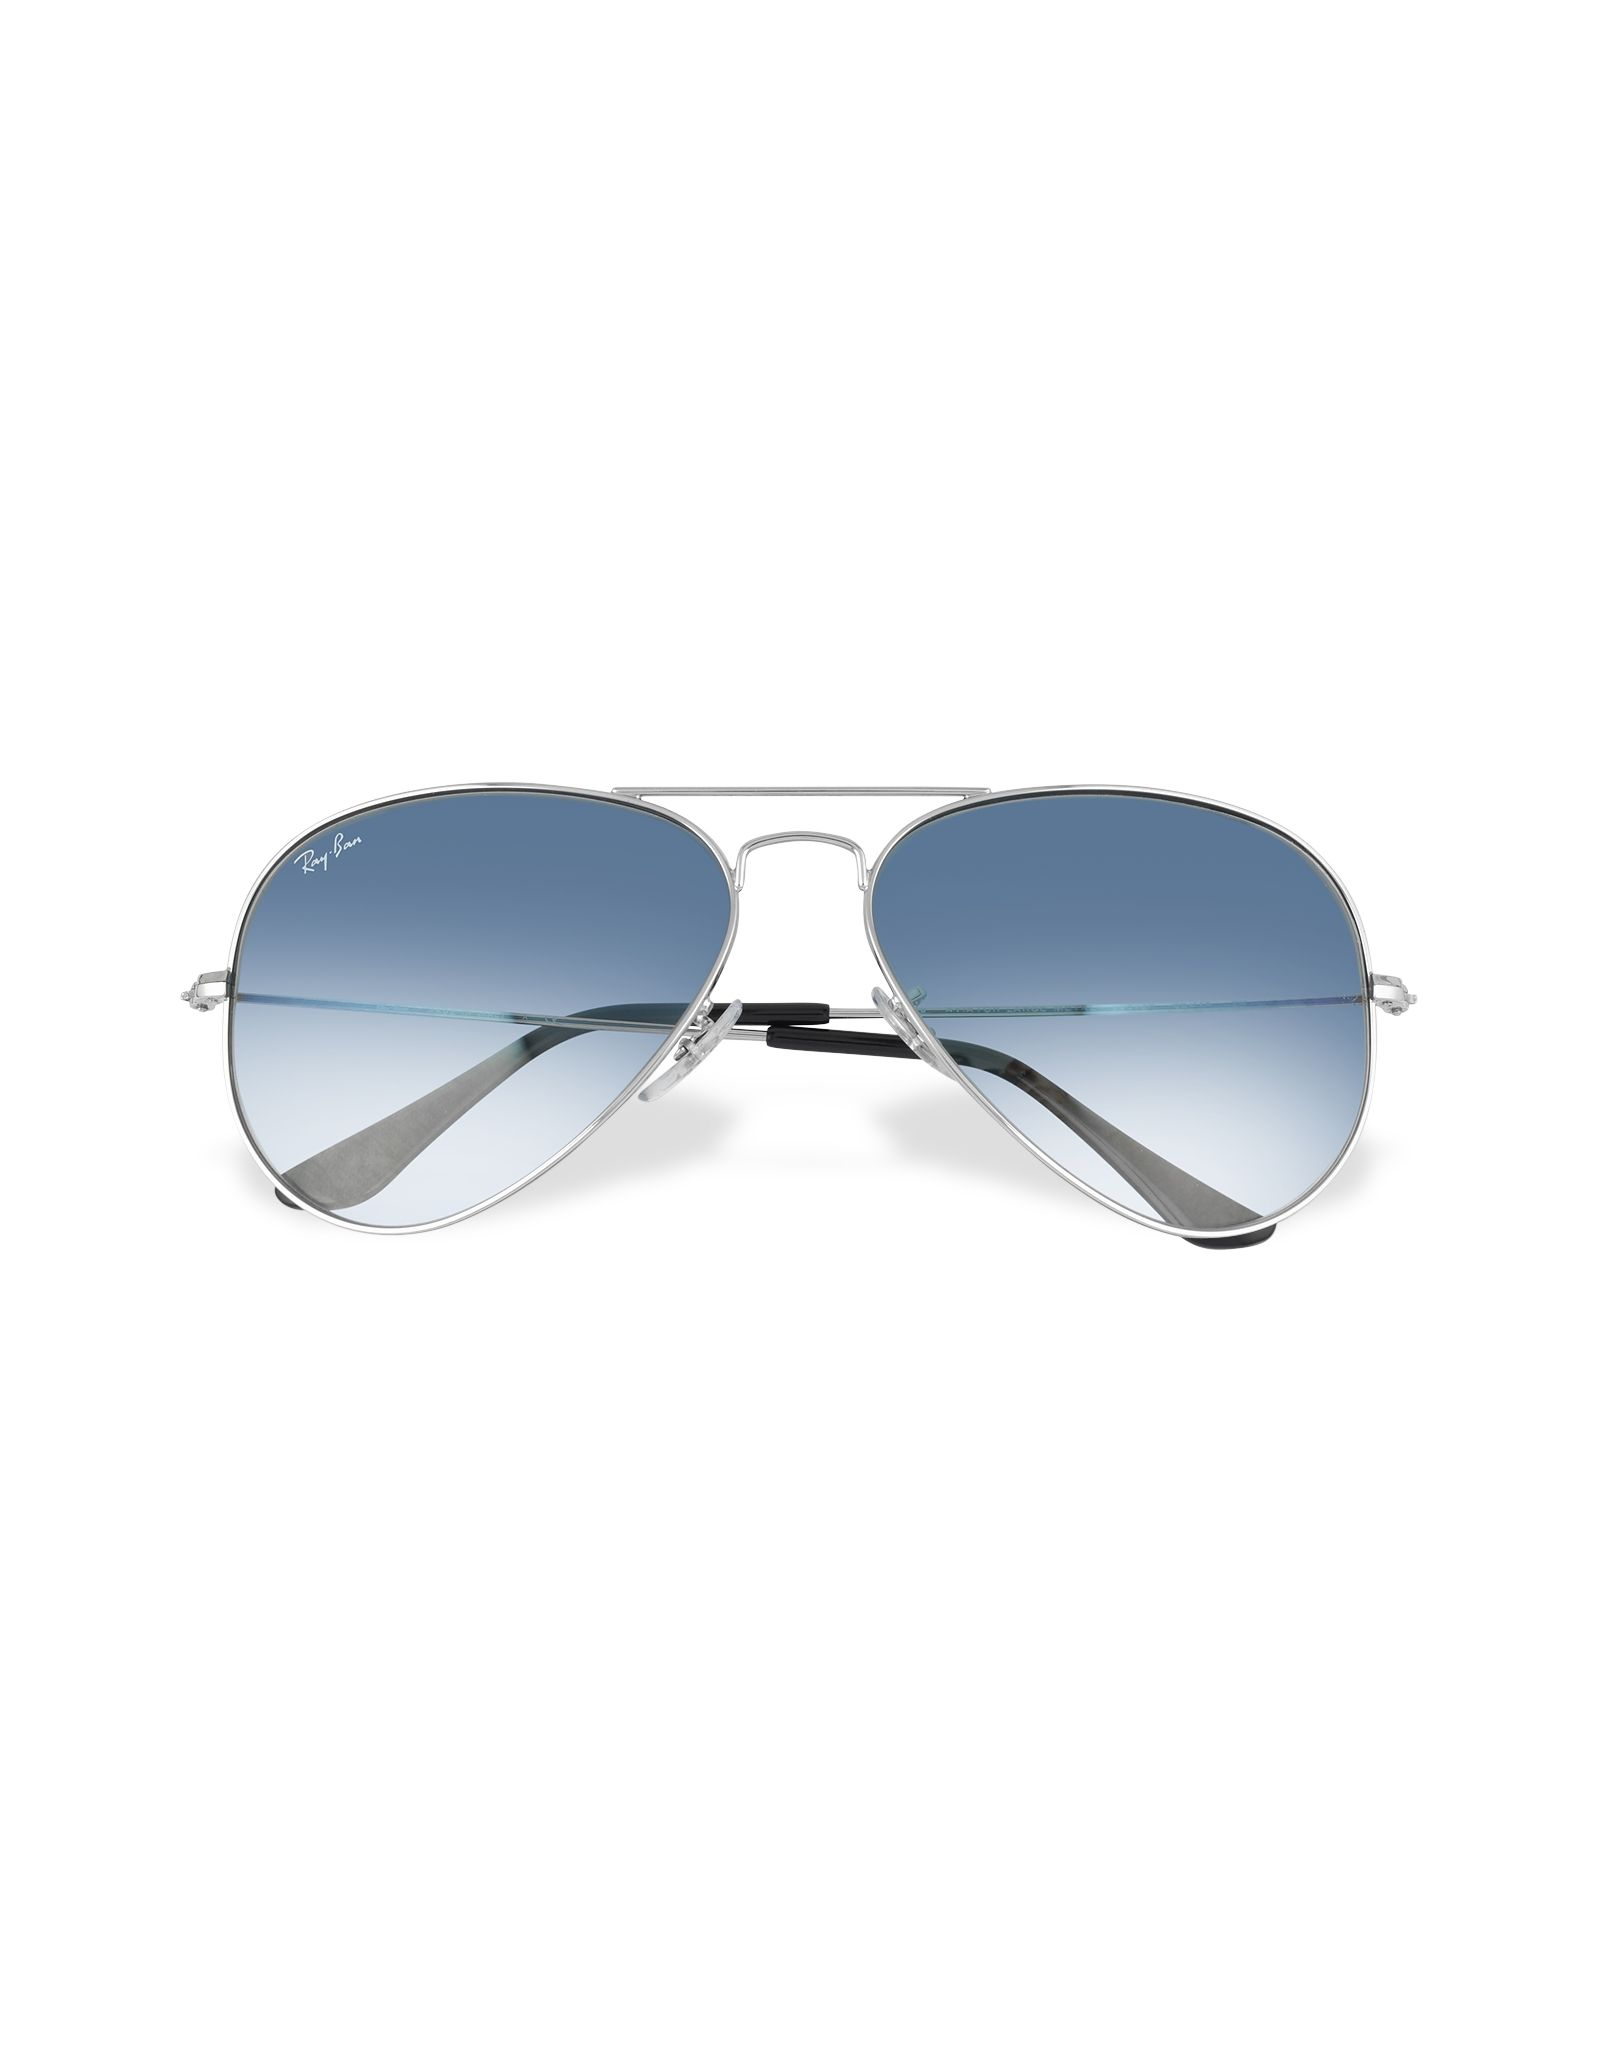 907eccdee9 Women s Metallic Aviator - Silvertone Metal Sunglasses